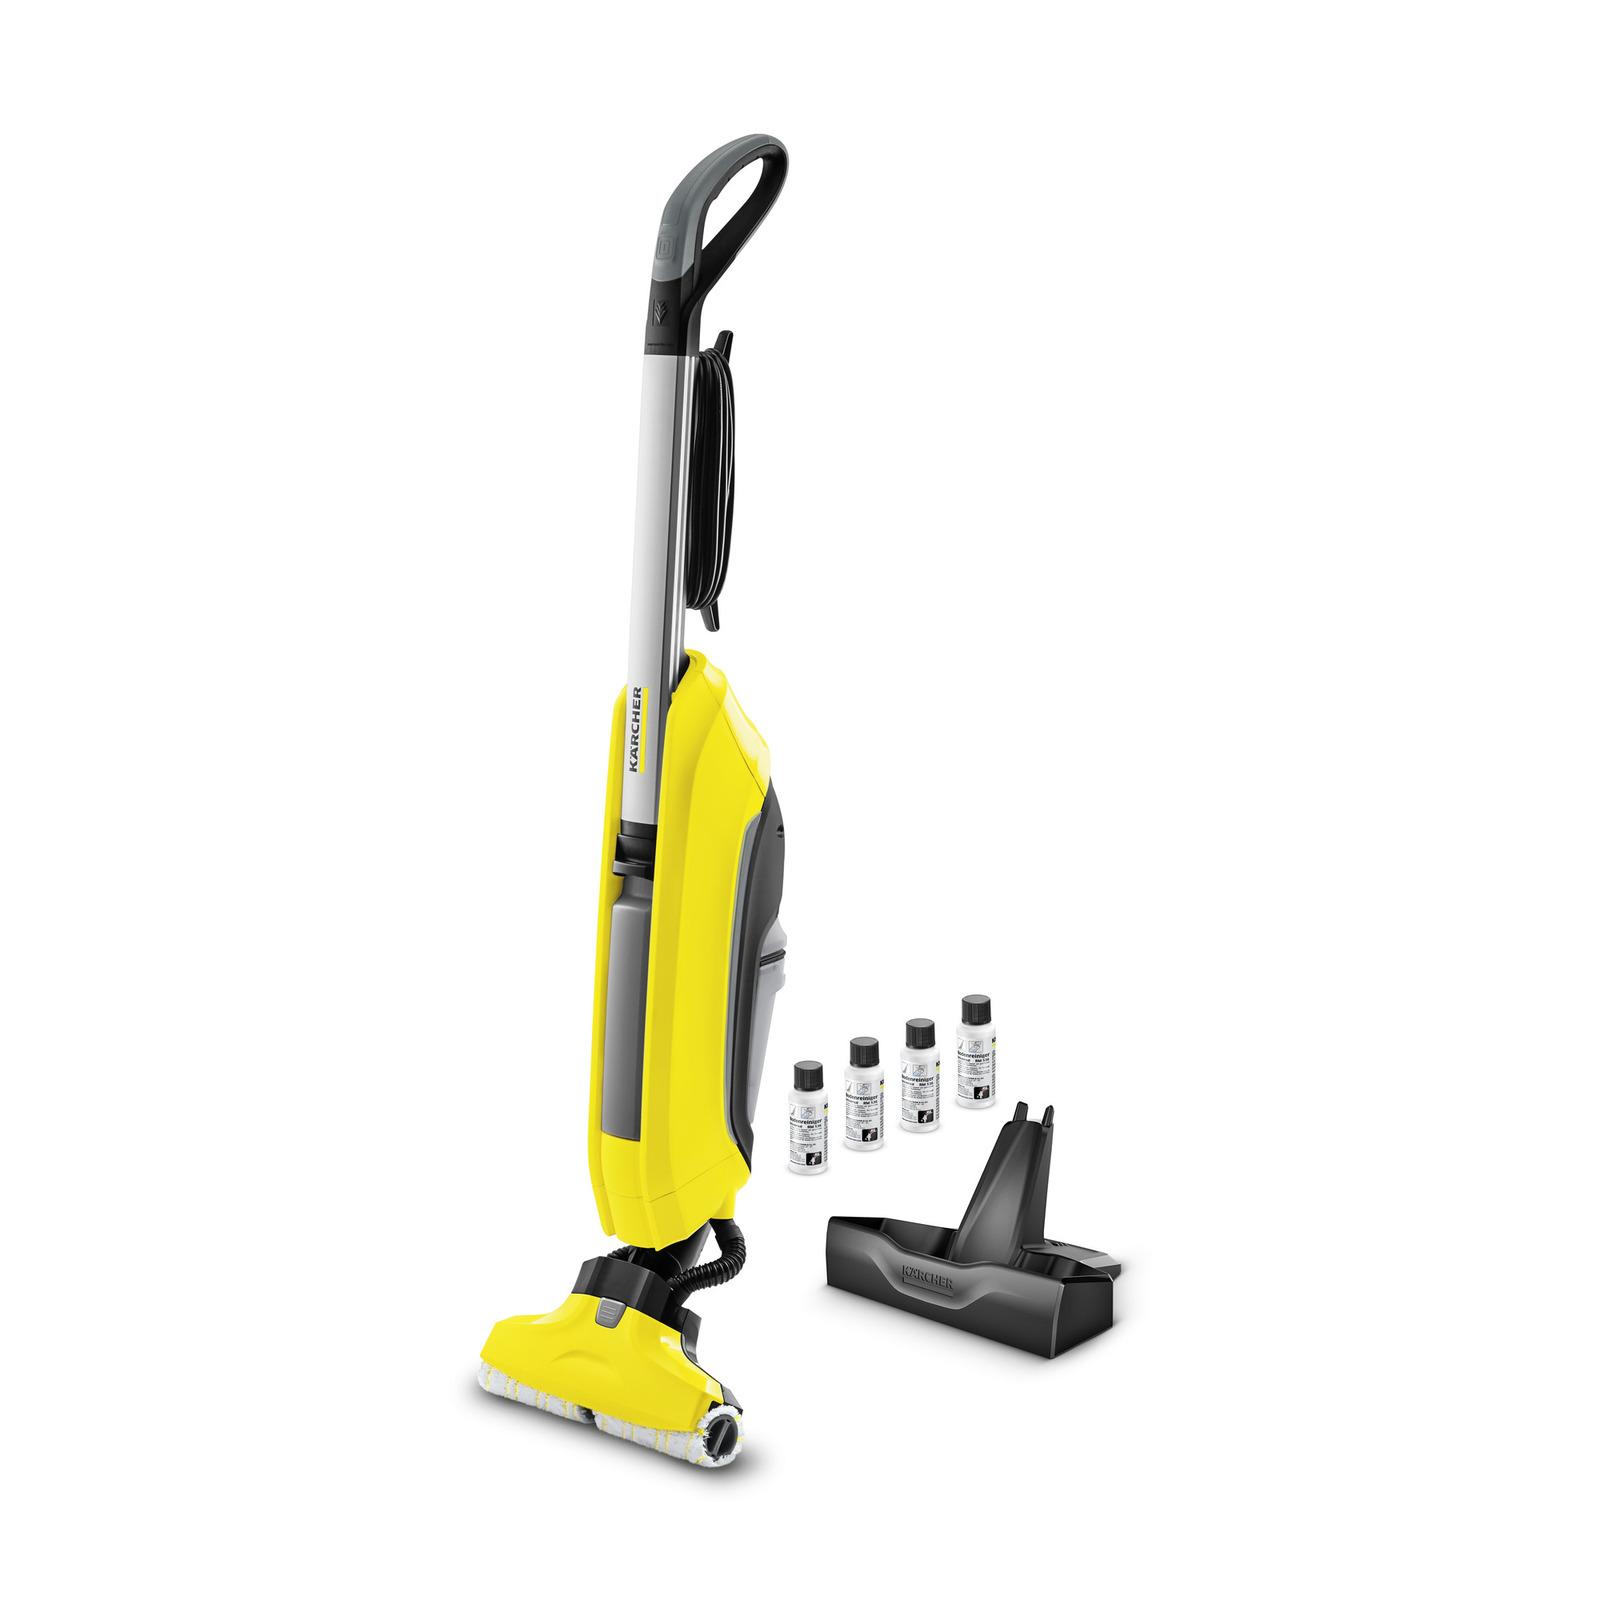 Kärcher FC Hard Floor Cleaner Kärcher - Bare floor cleaner machine